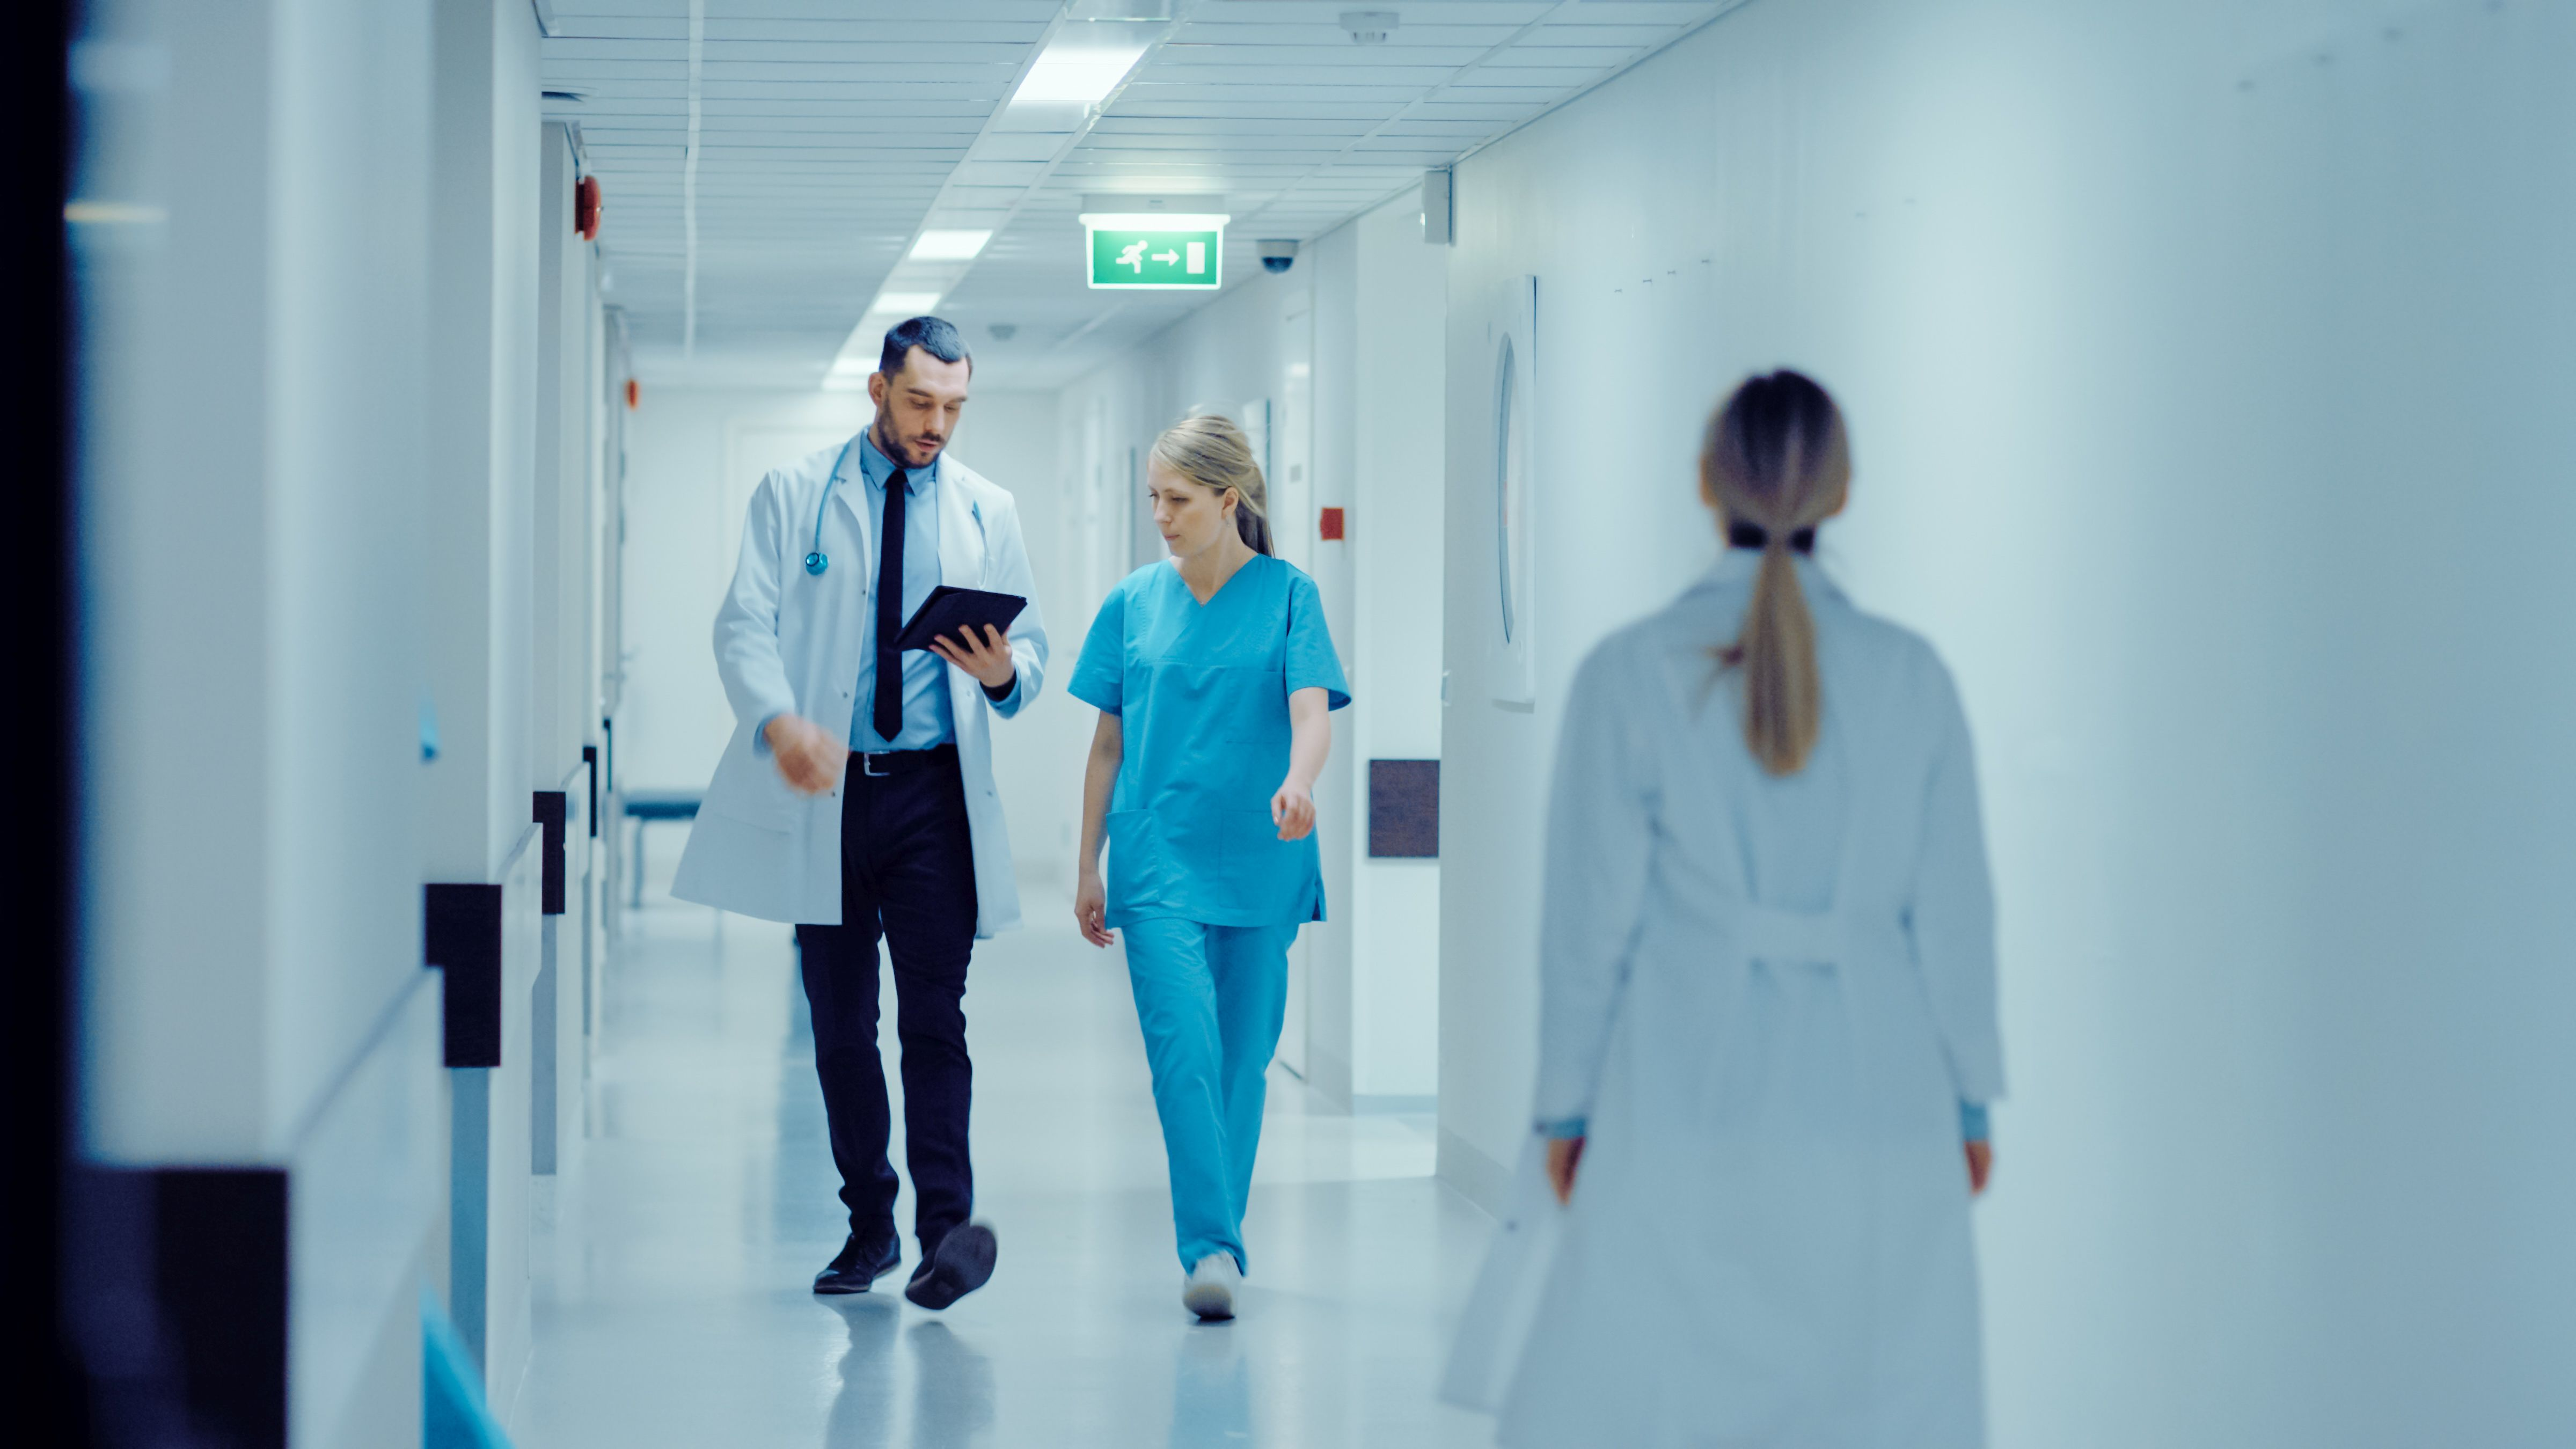 Hospital Staff Often Ignore Alerts Warning of Overtesting, Study